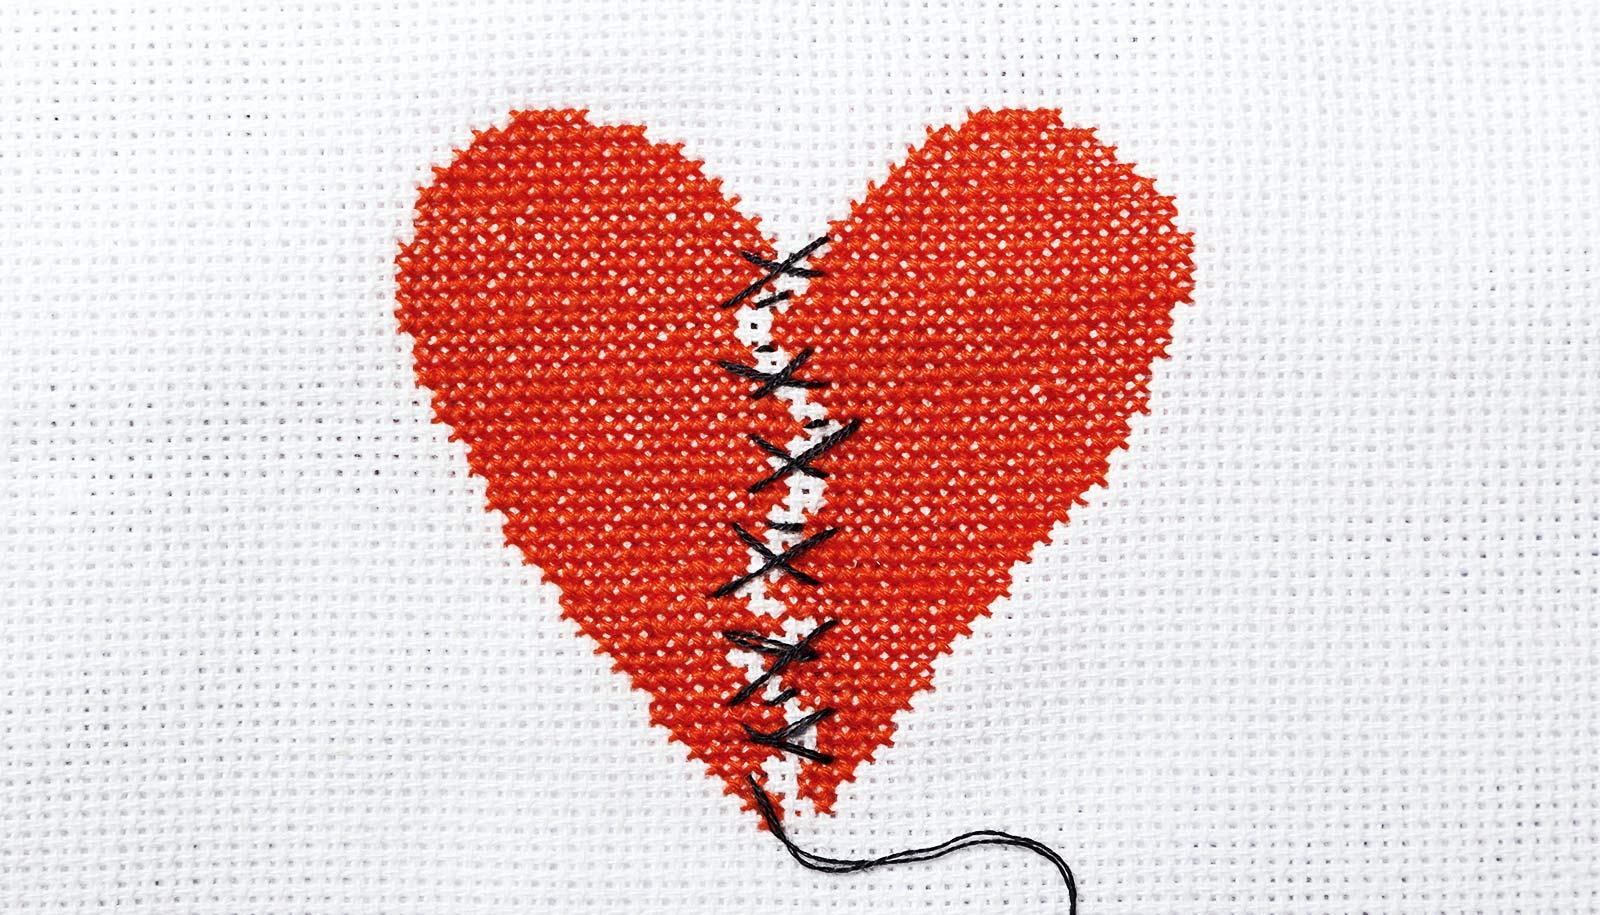 Protein tweak may prevent DMD-related heart disease